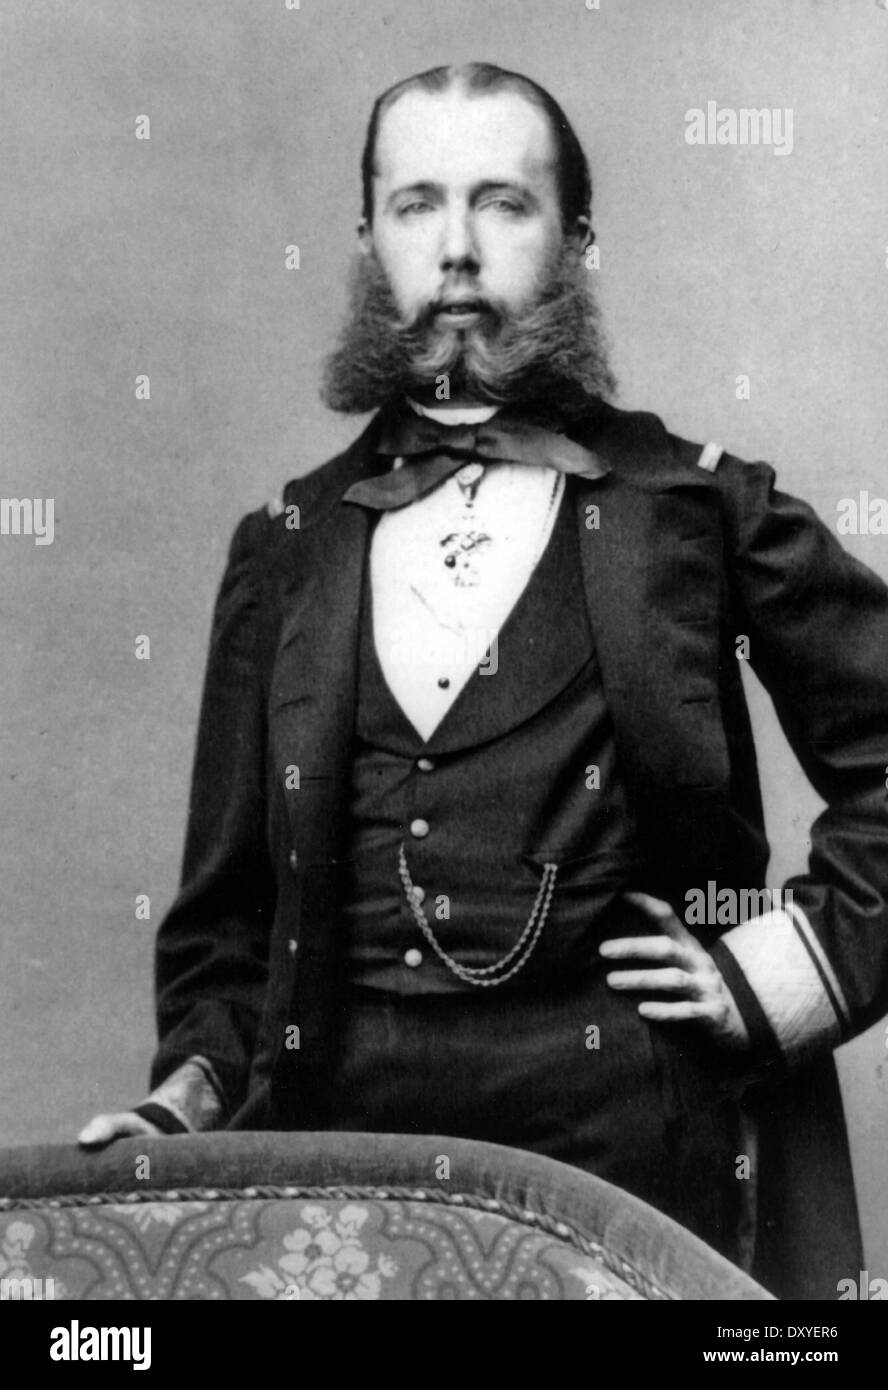 MAXIMILIAN I OF MEXICO (1832-1867) about 1846 - Stock Image